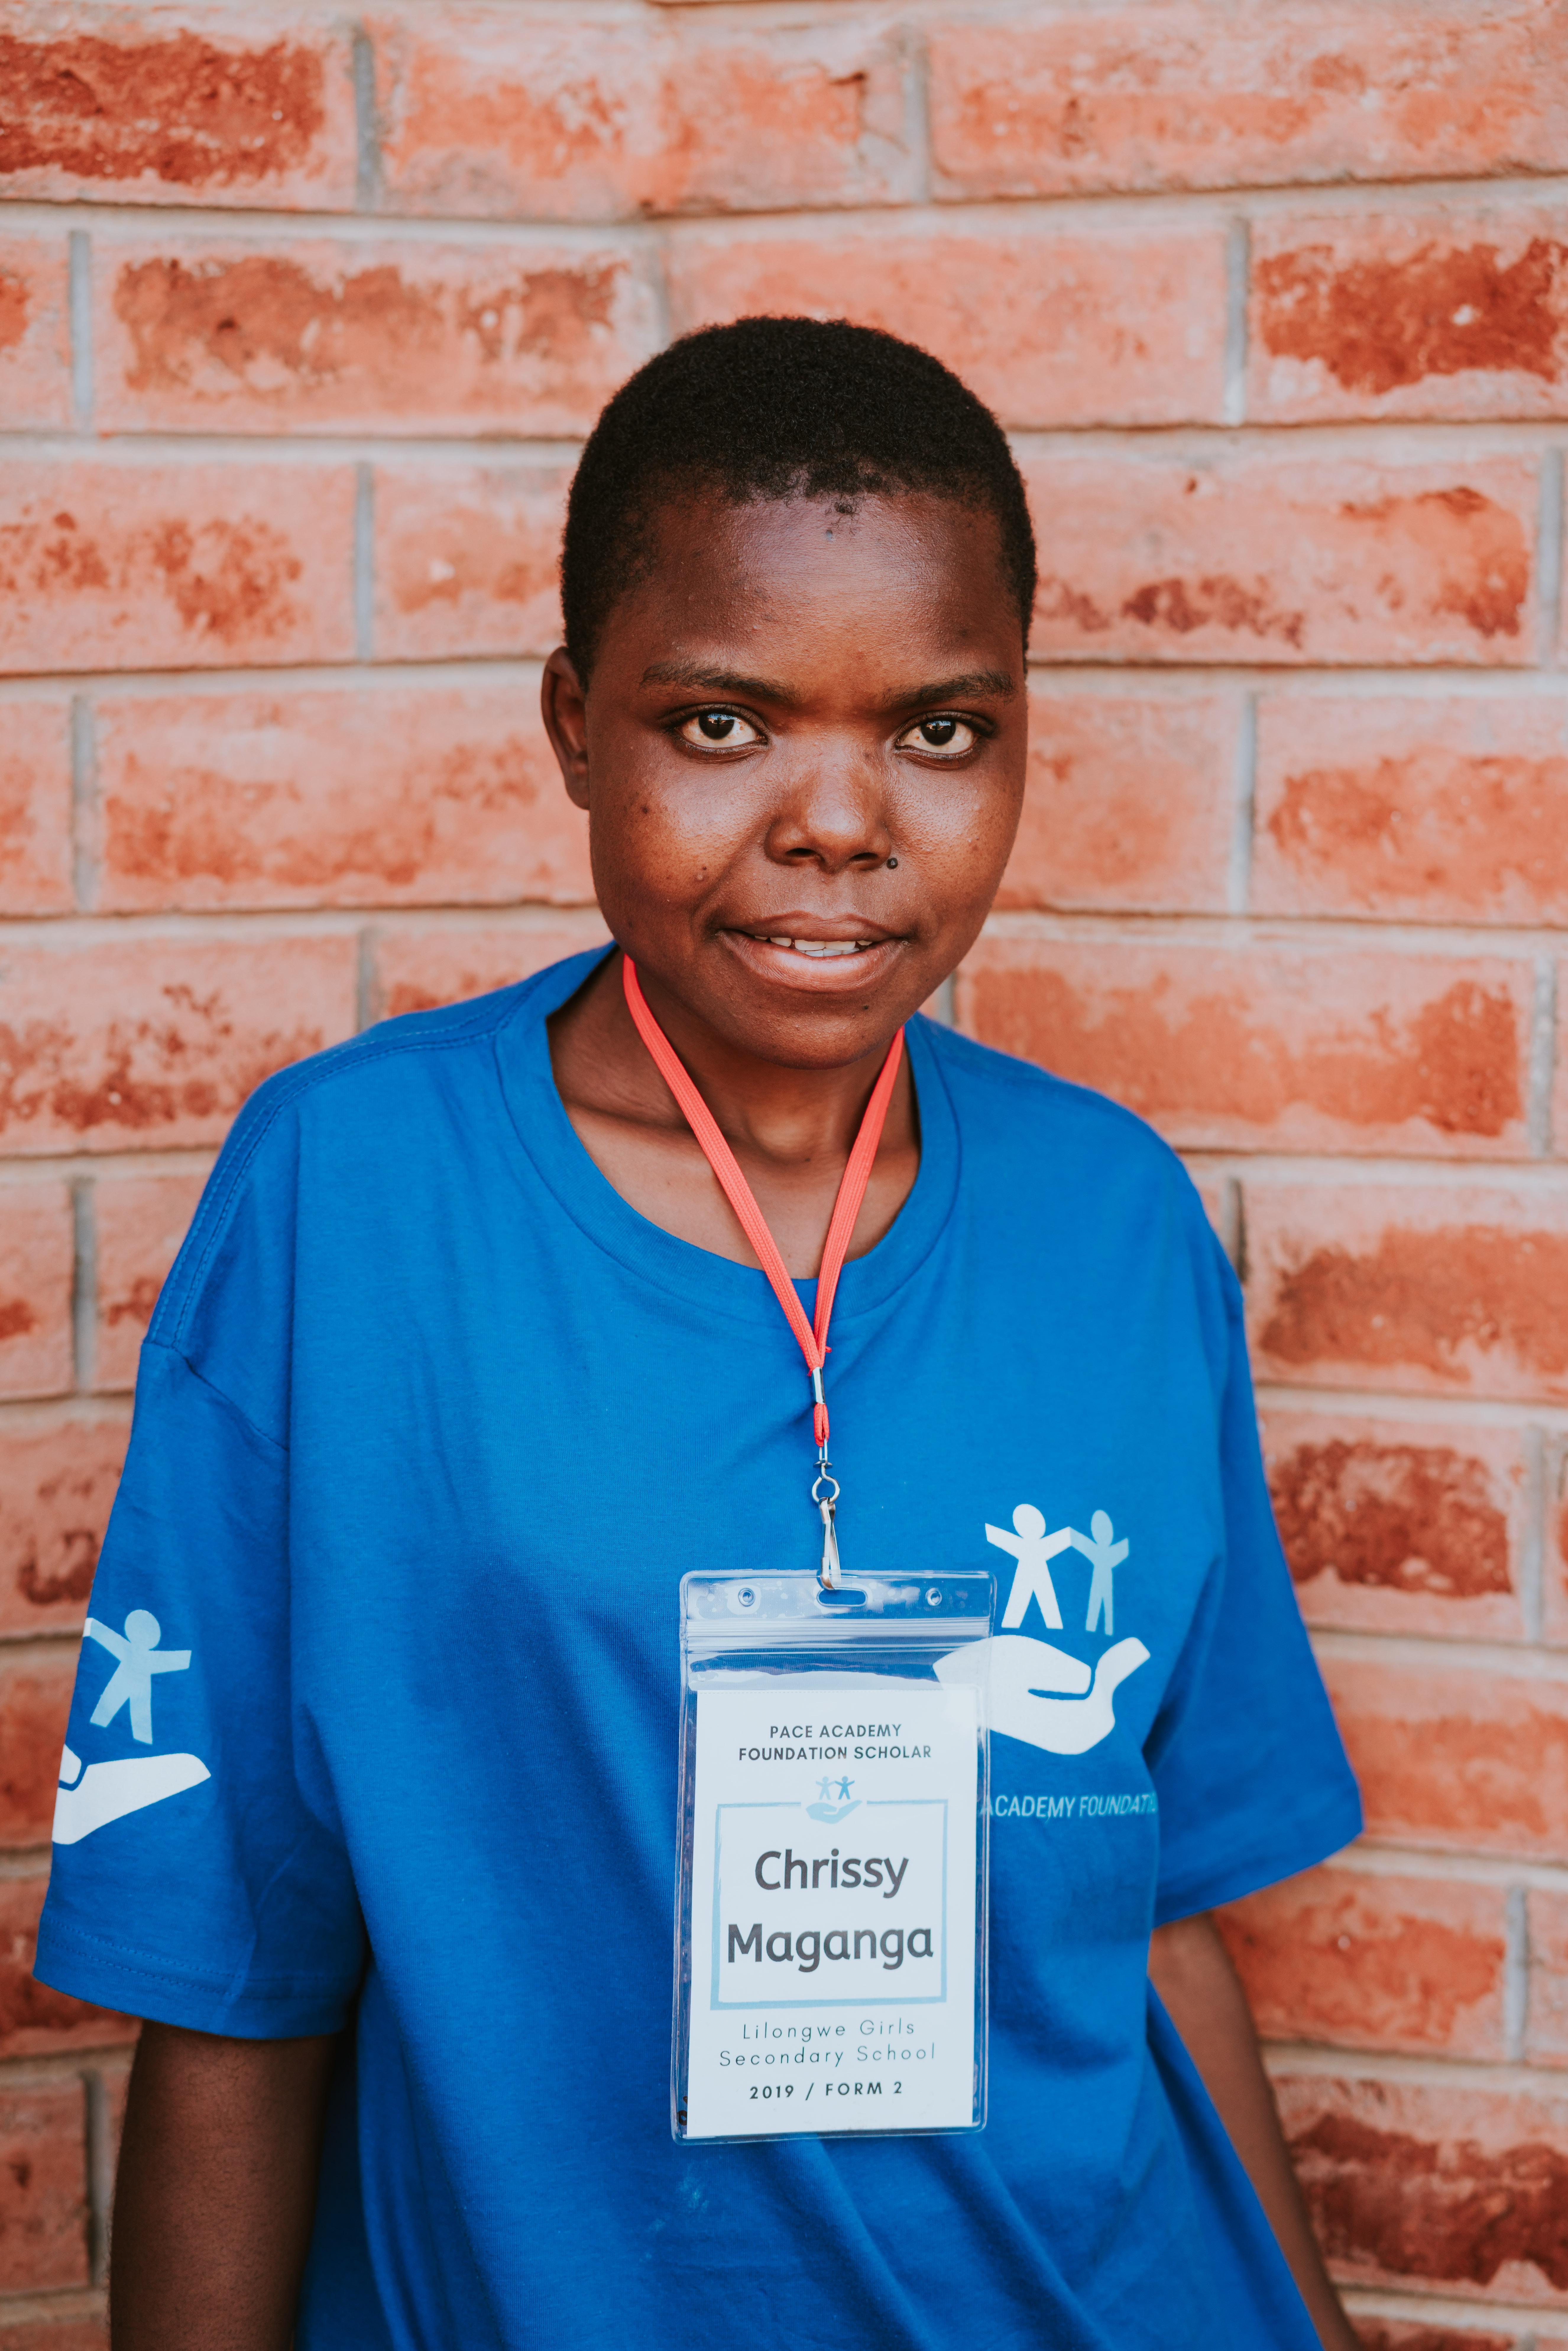 Chrissy Maganga (Lilongwe Girls Secondar